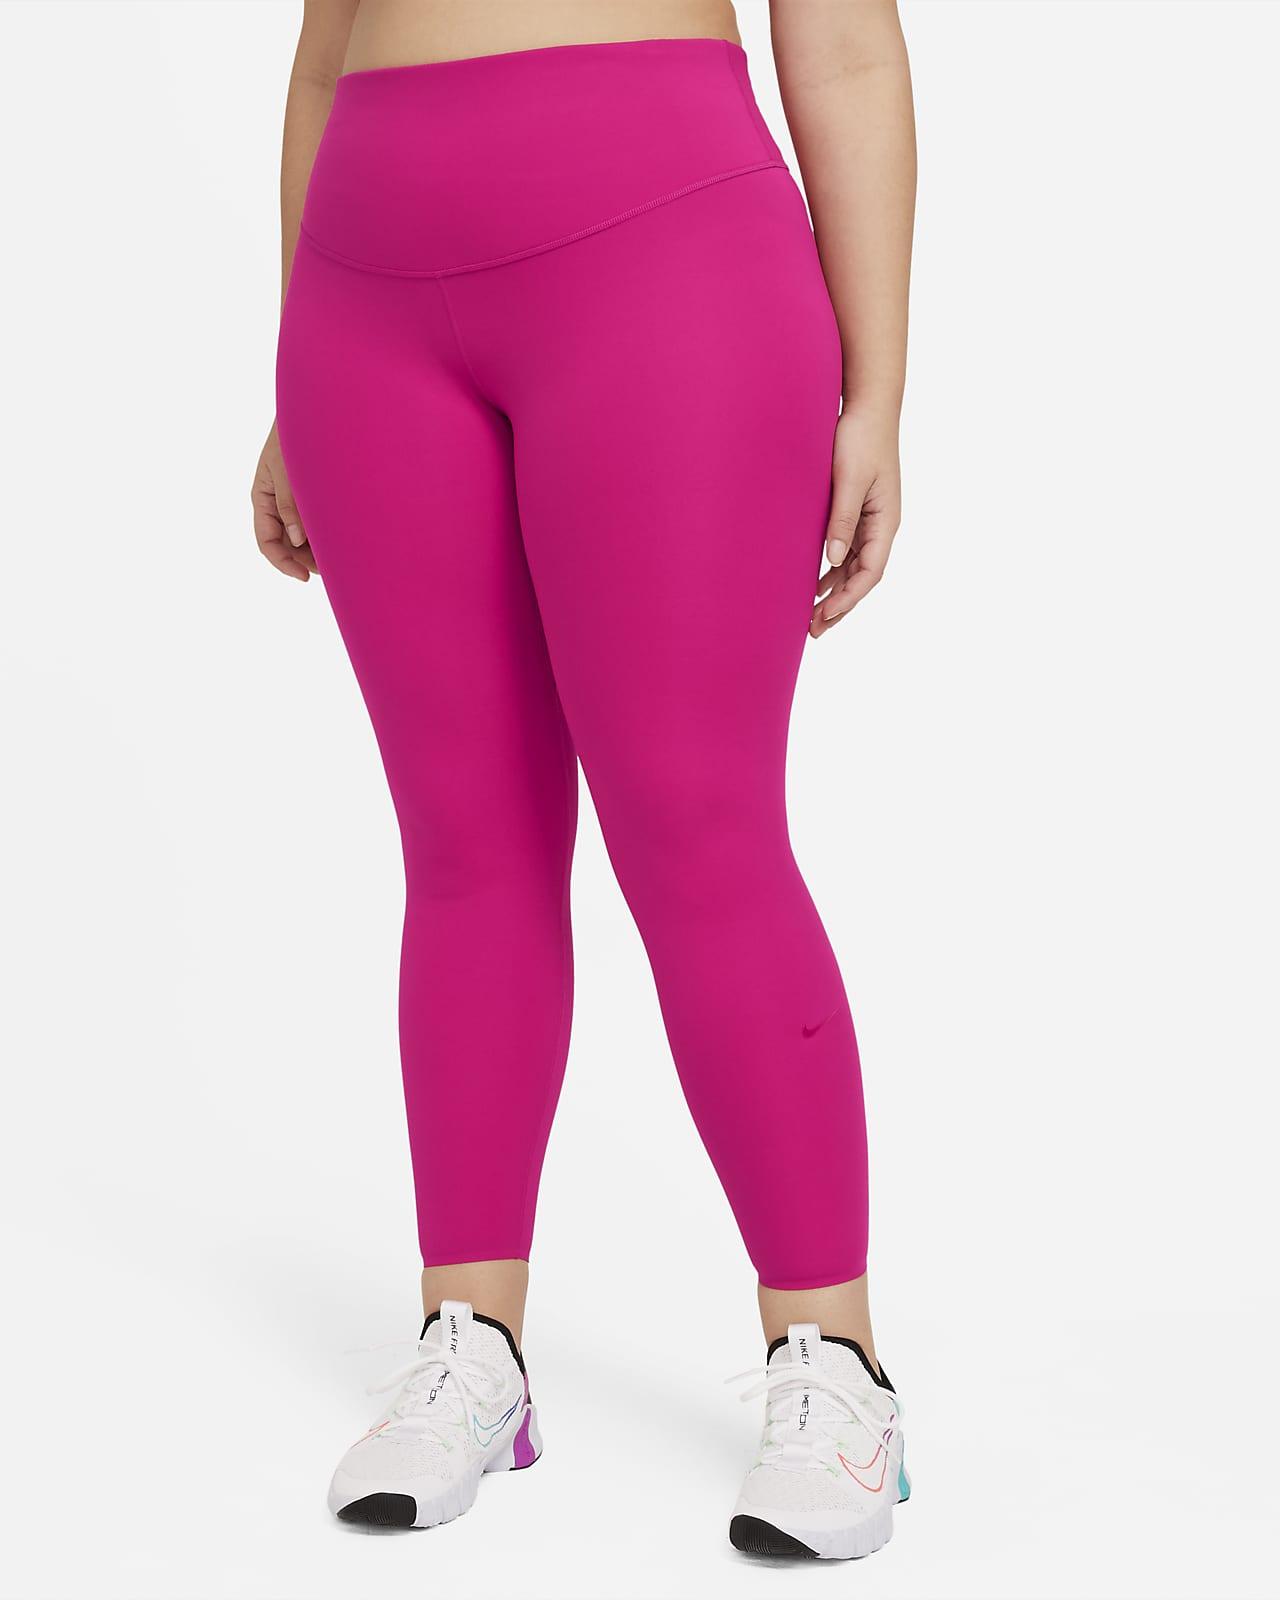 Nike One Luxe Women's Mid-Rise 7/8 Leggings (Plus Size)